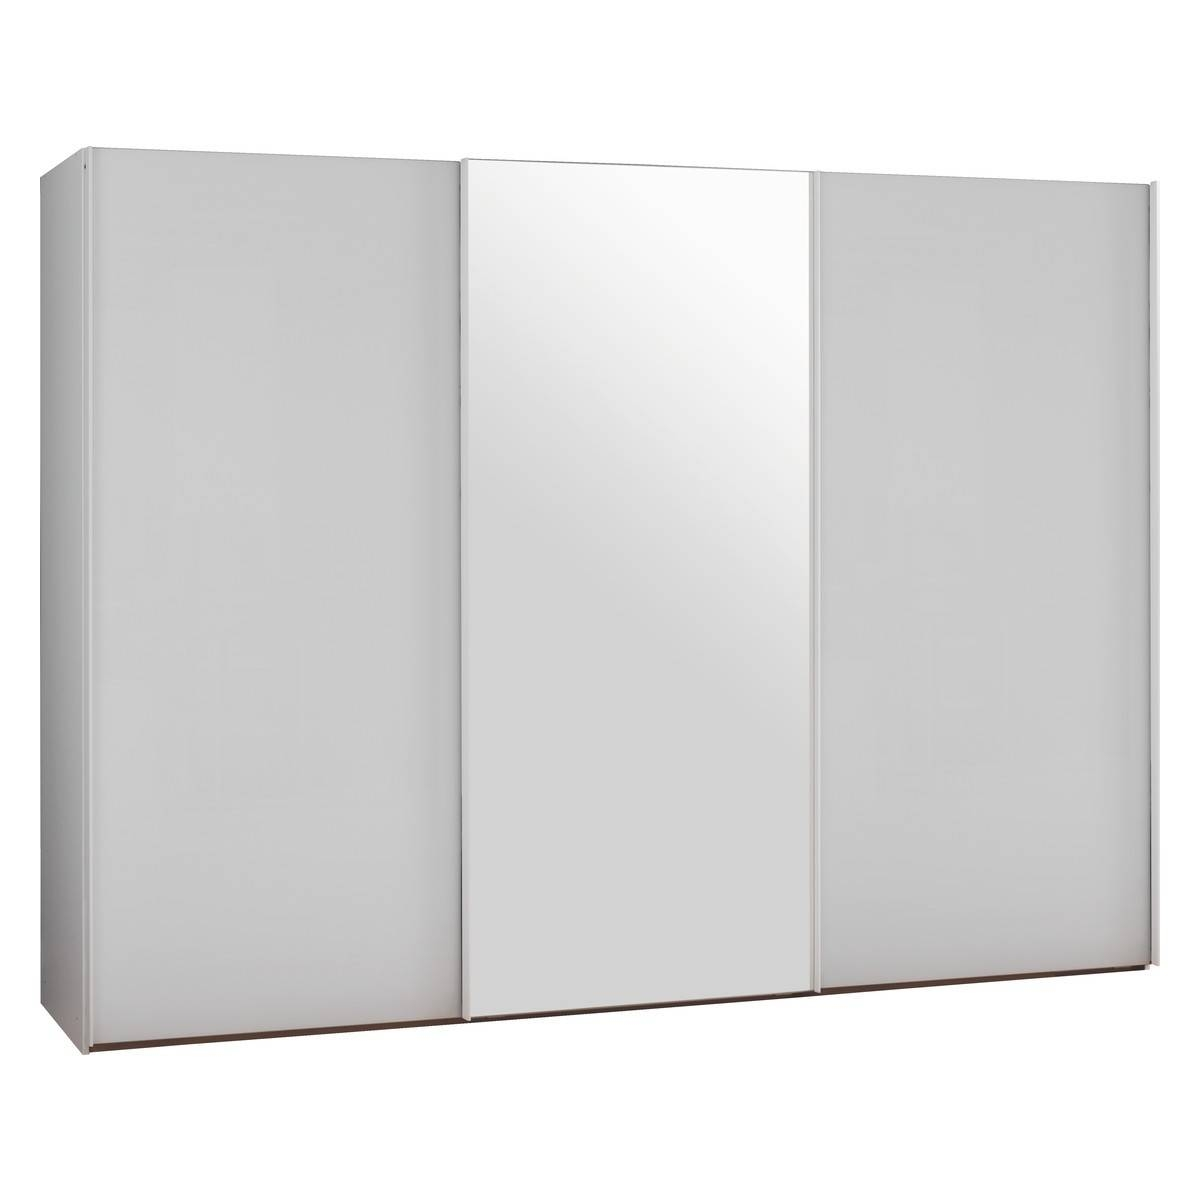 Kripton Mirrored And White Glass 3 Door Sliding Wardrobe W240 X pertaining to White Gloss Sliding Wardrobes (Image 4 of 15)